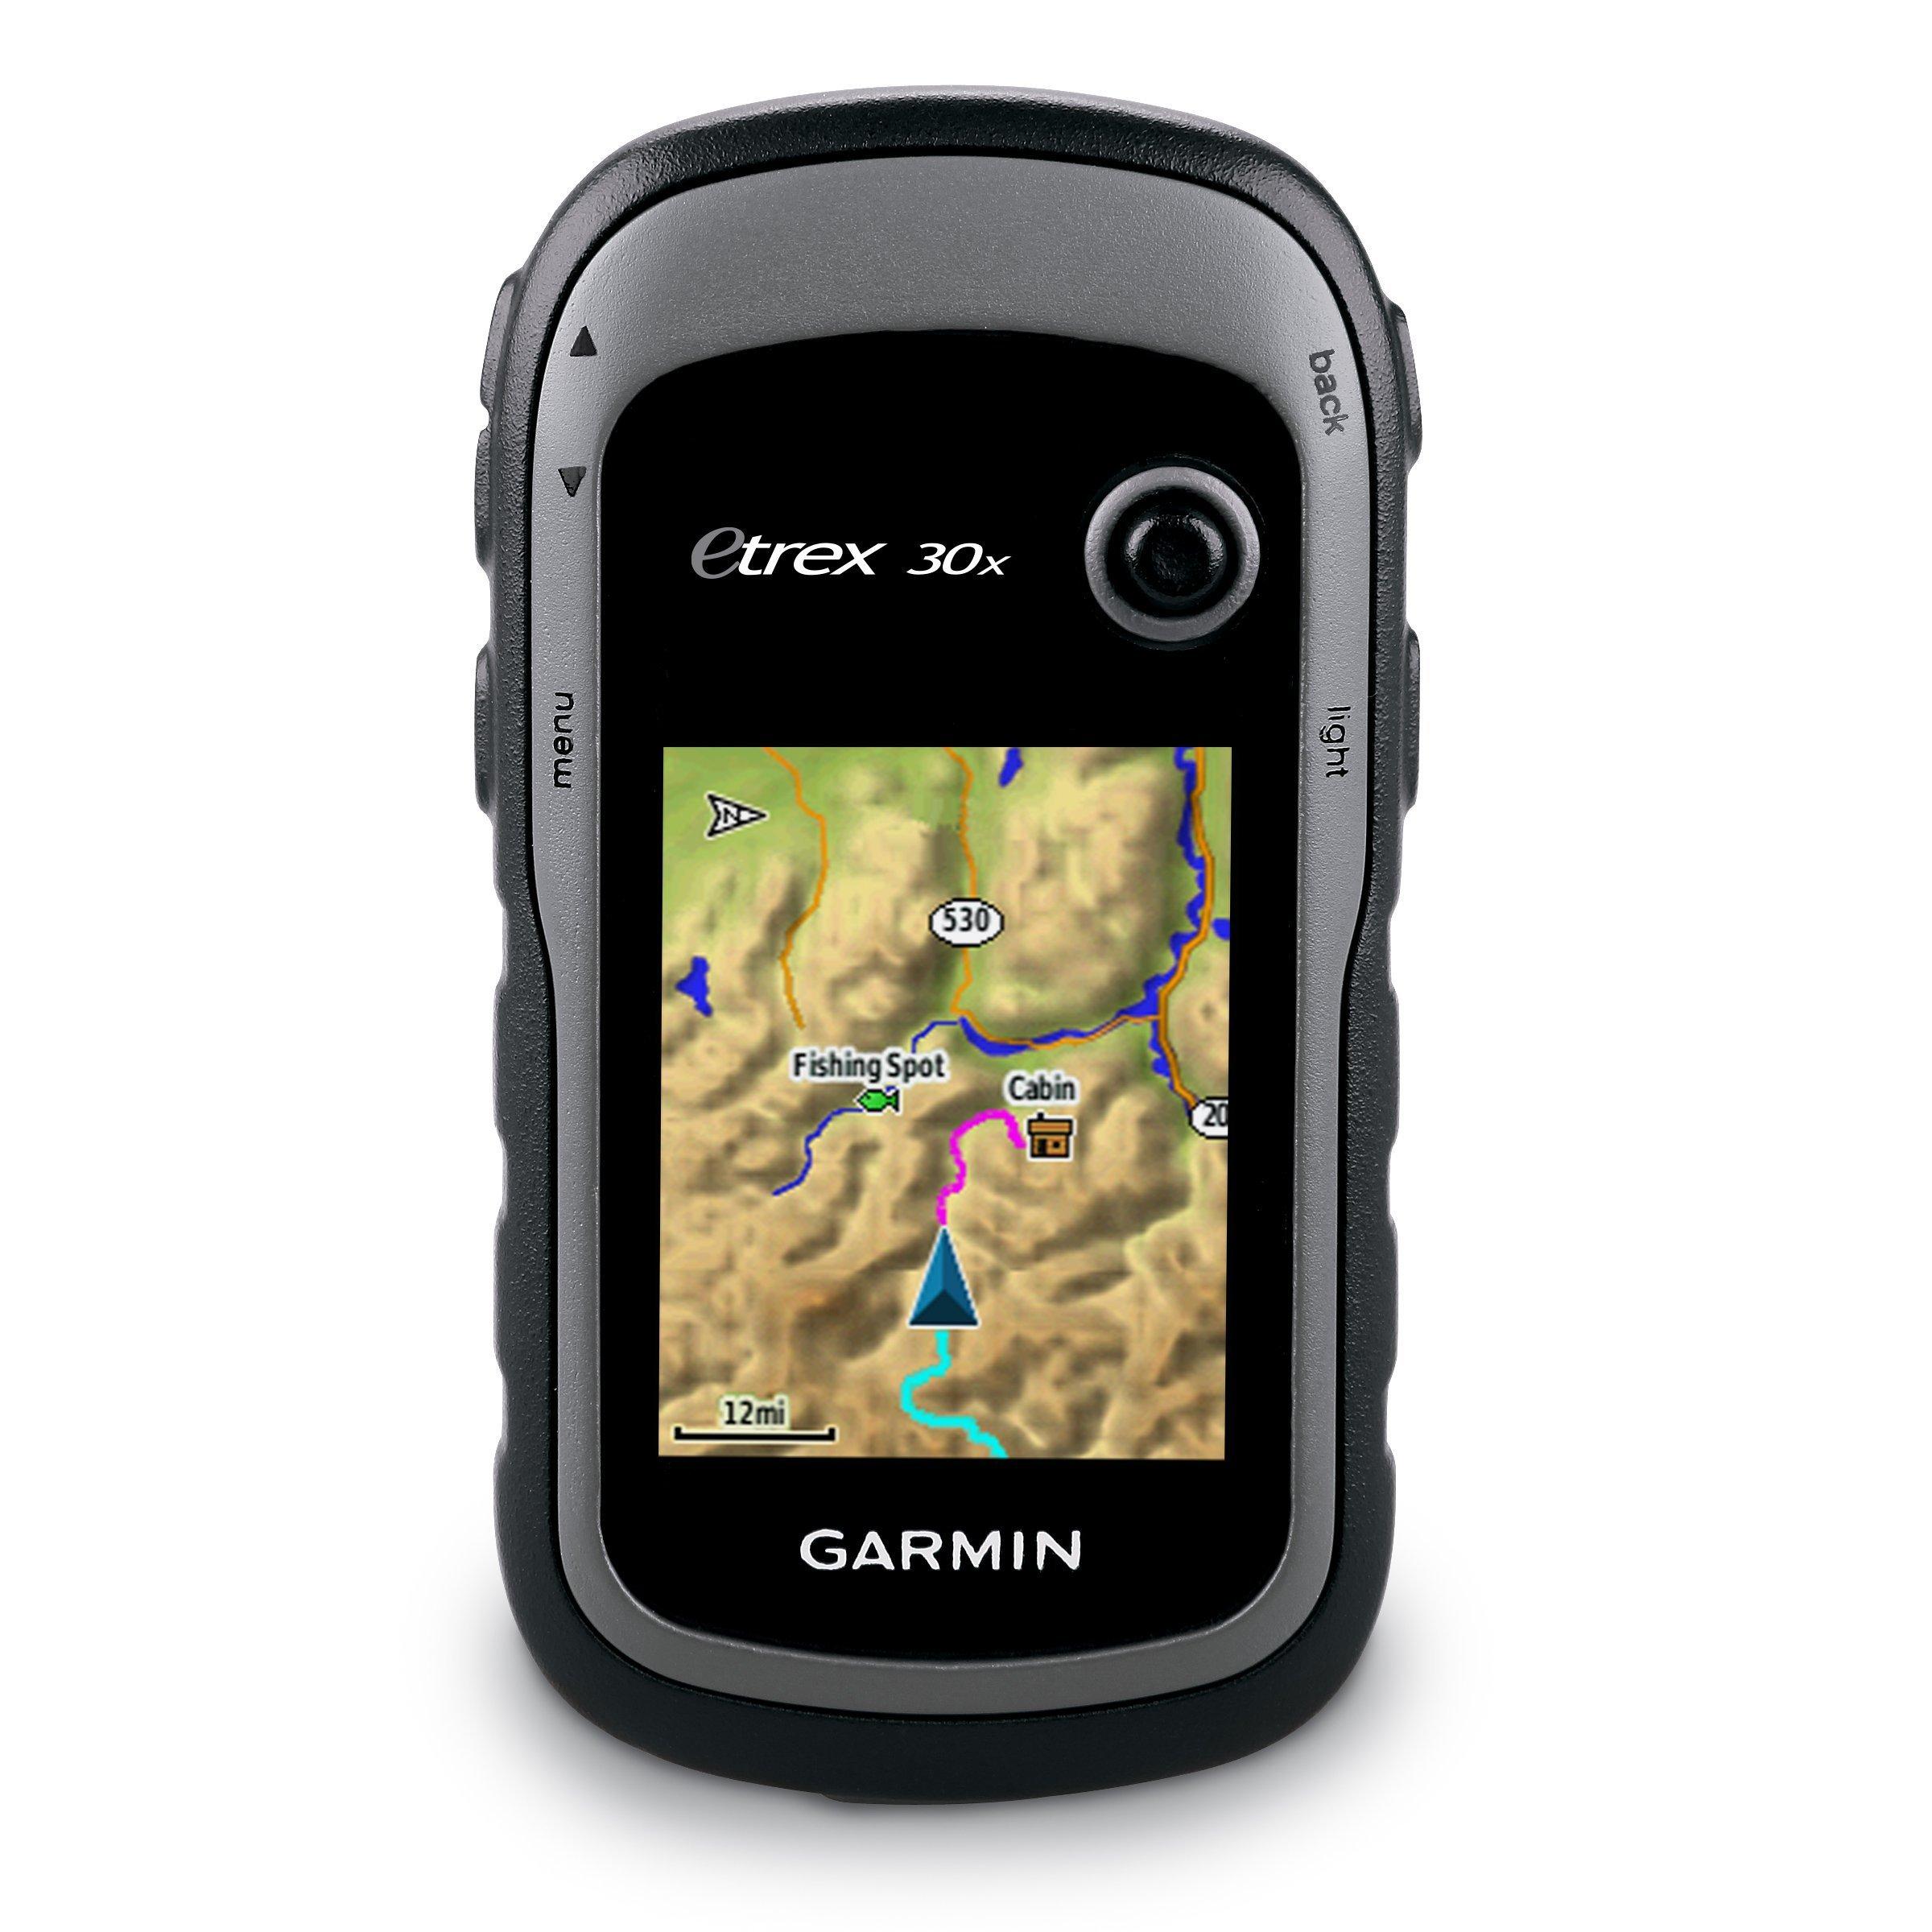 Garmin eTrex 30x 010-01508-10 Handheld Navigator by Garmin